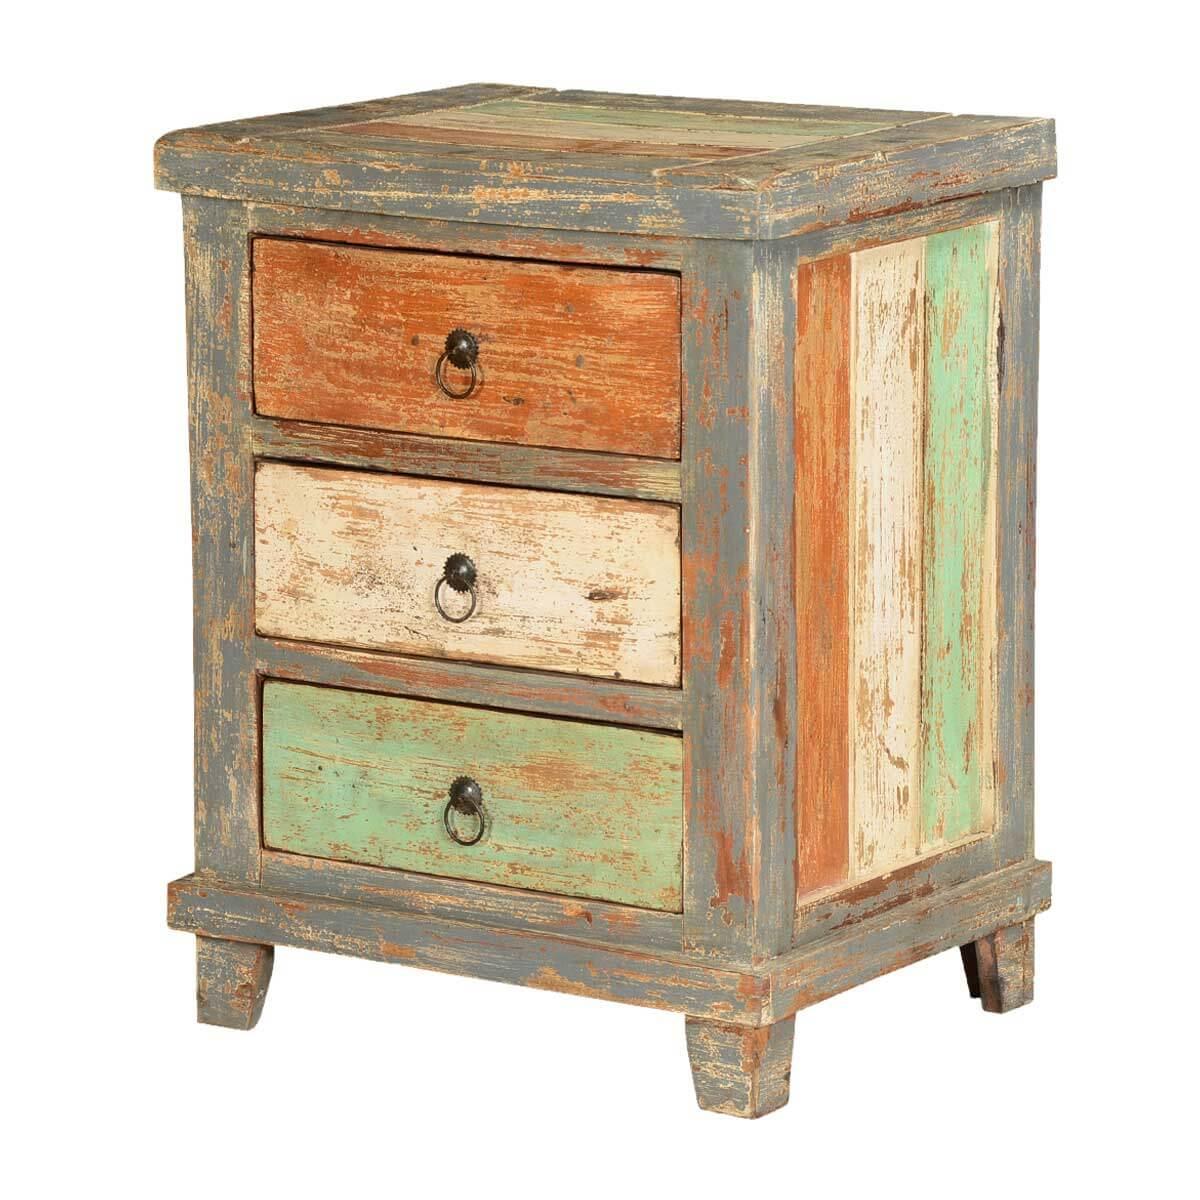 Orange White Green Stripes Mango Wood Rustic Nightstand End Table